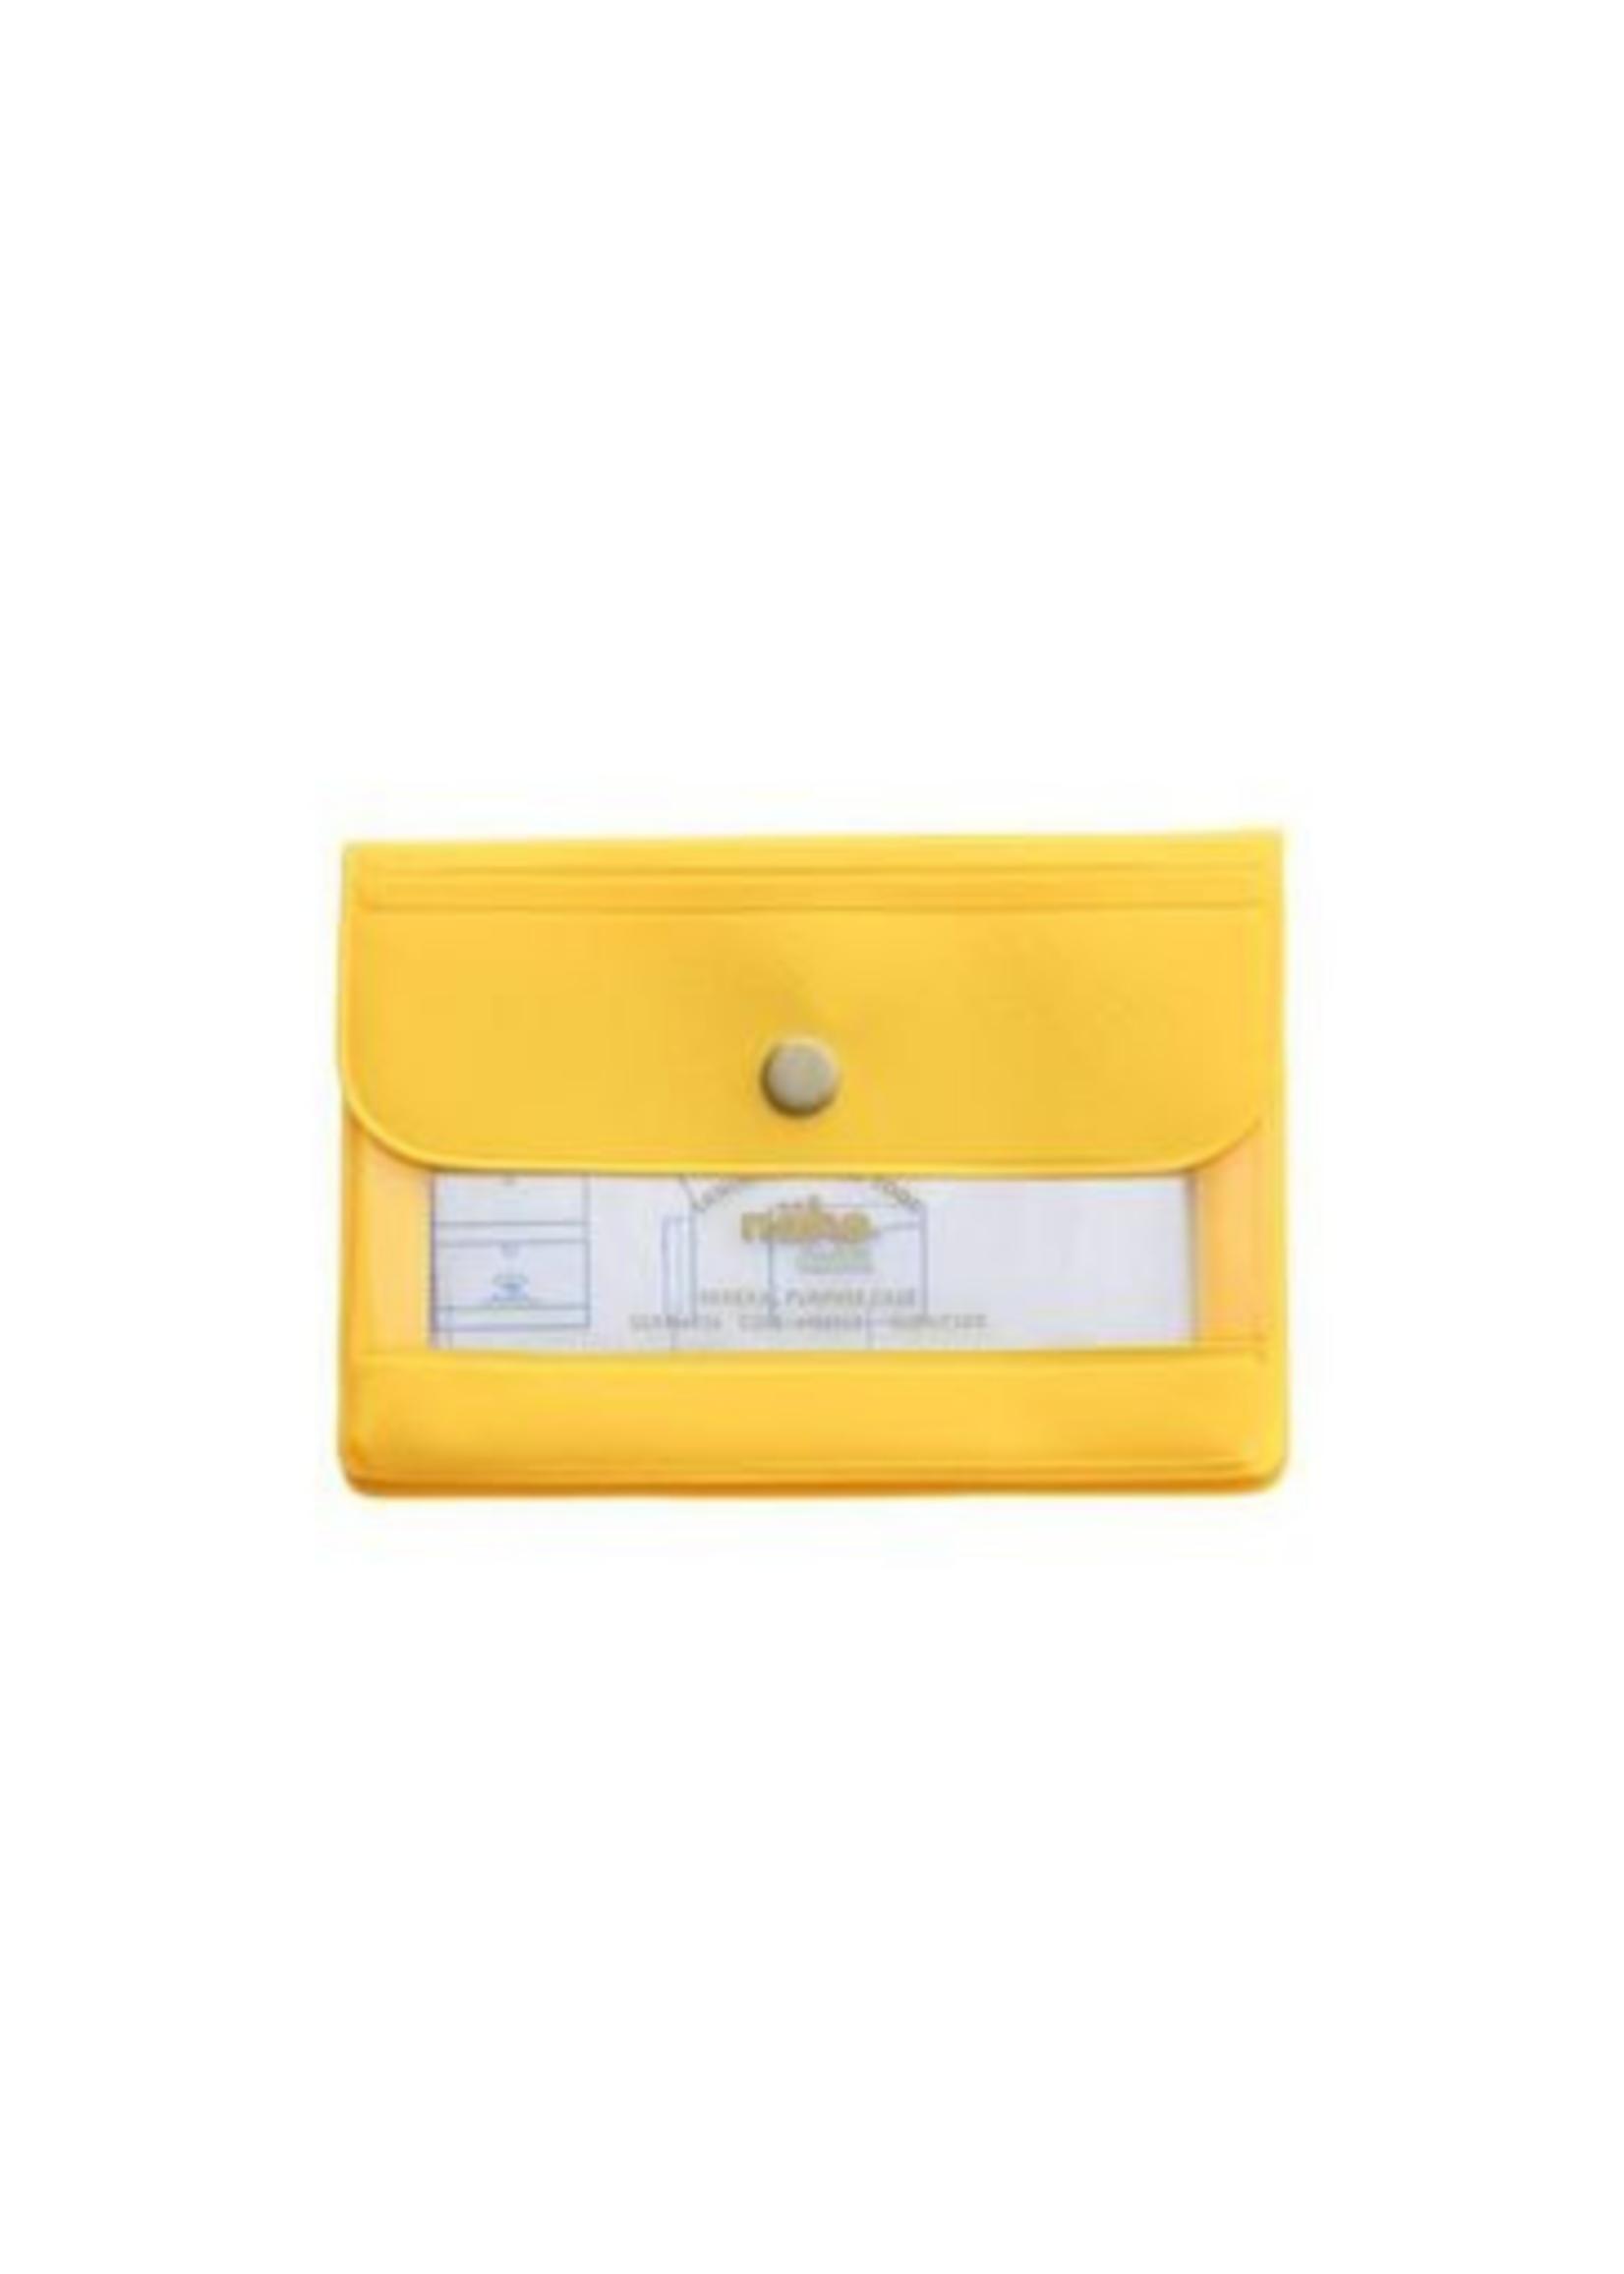 Hightide USA Hightide USA A7 General Purpose Case Yellow